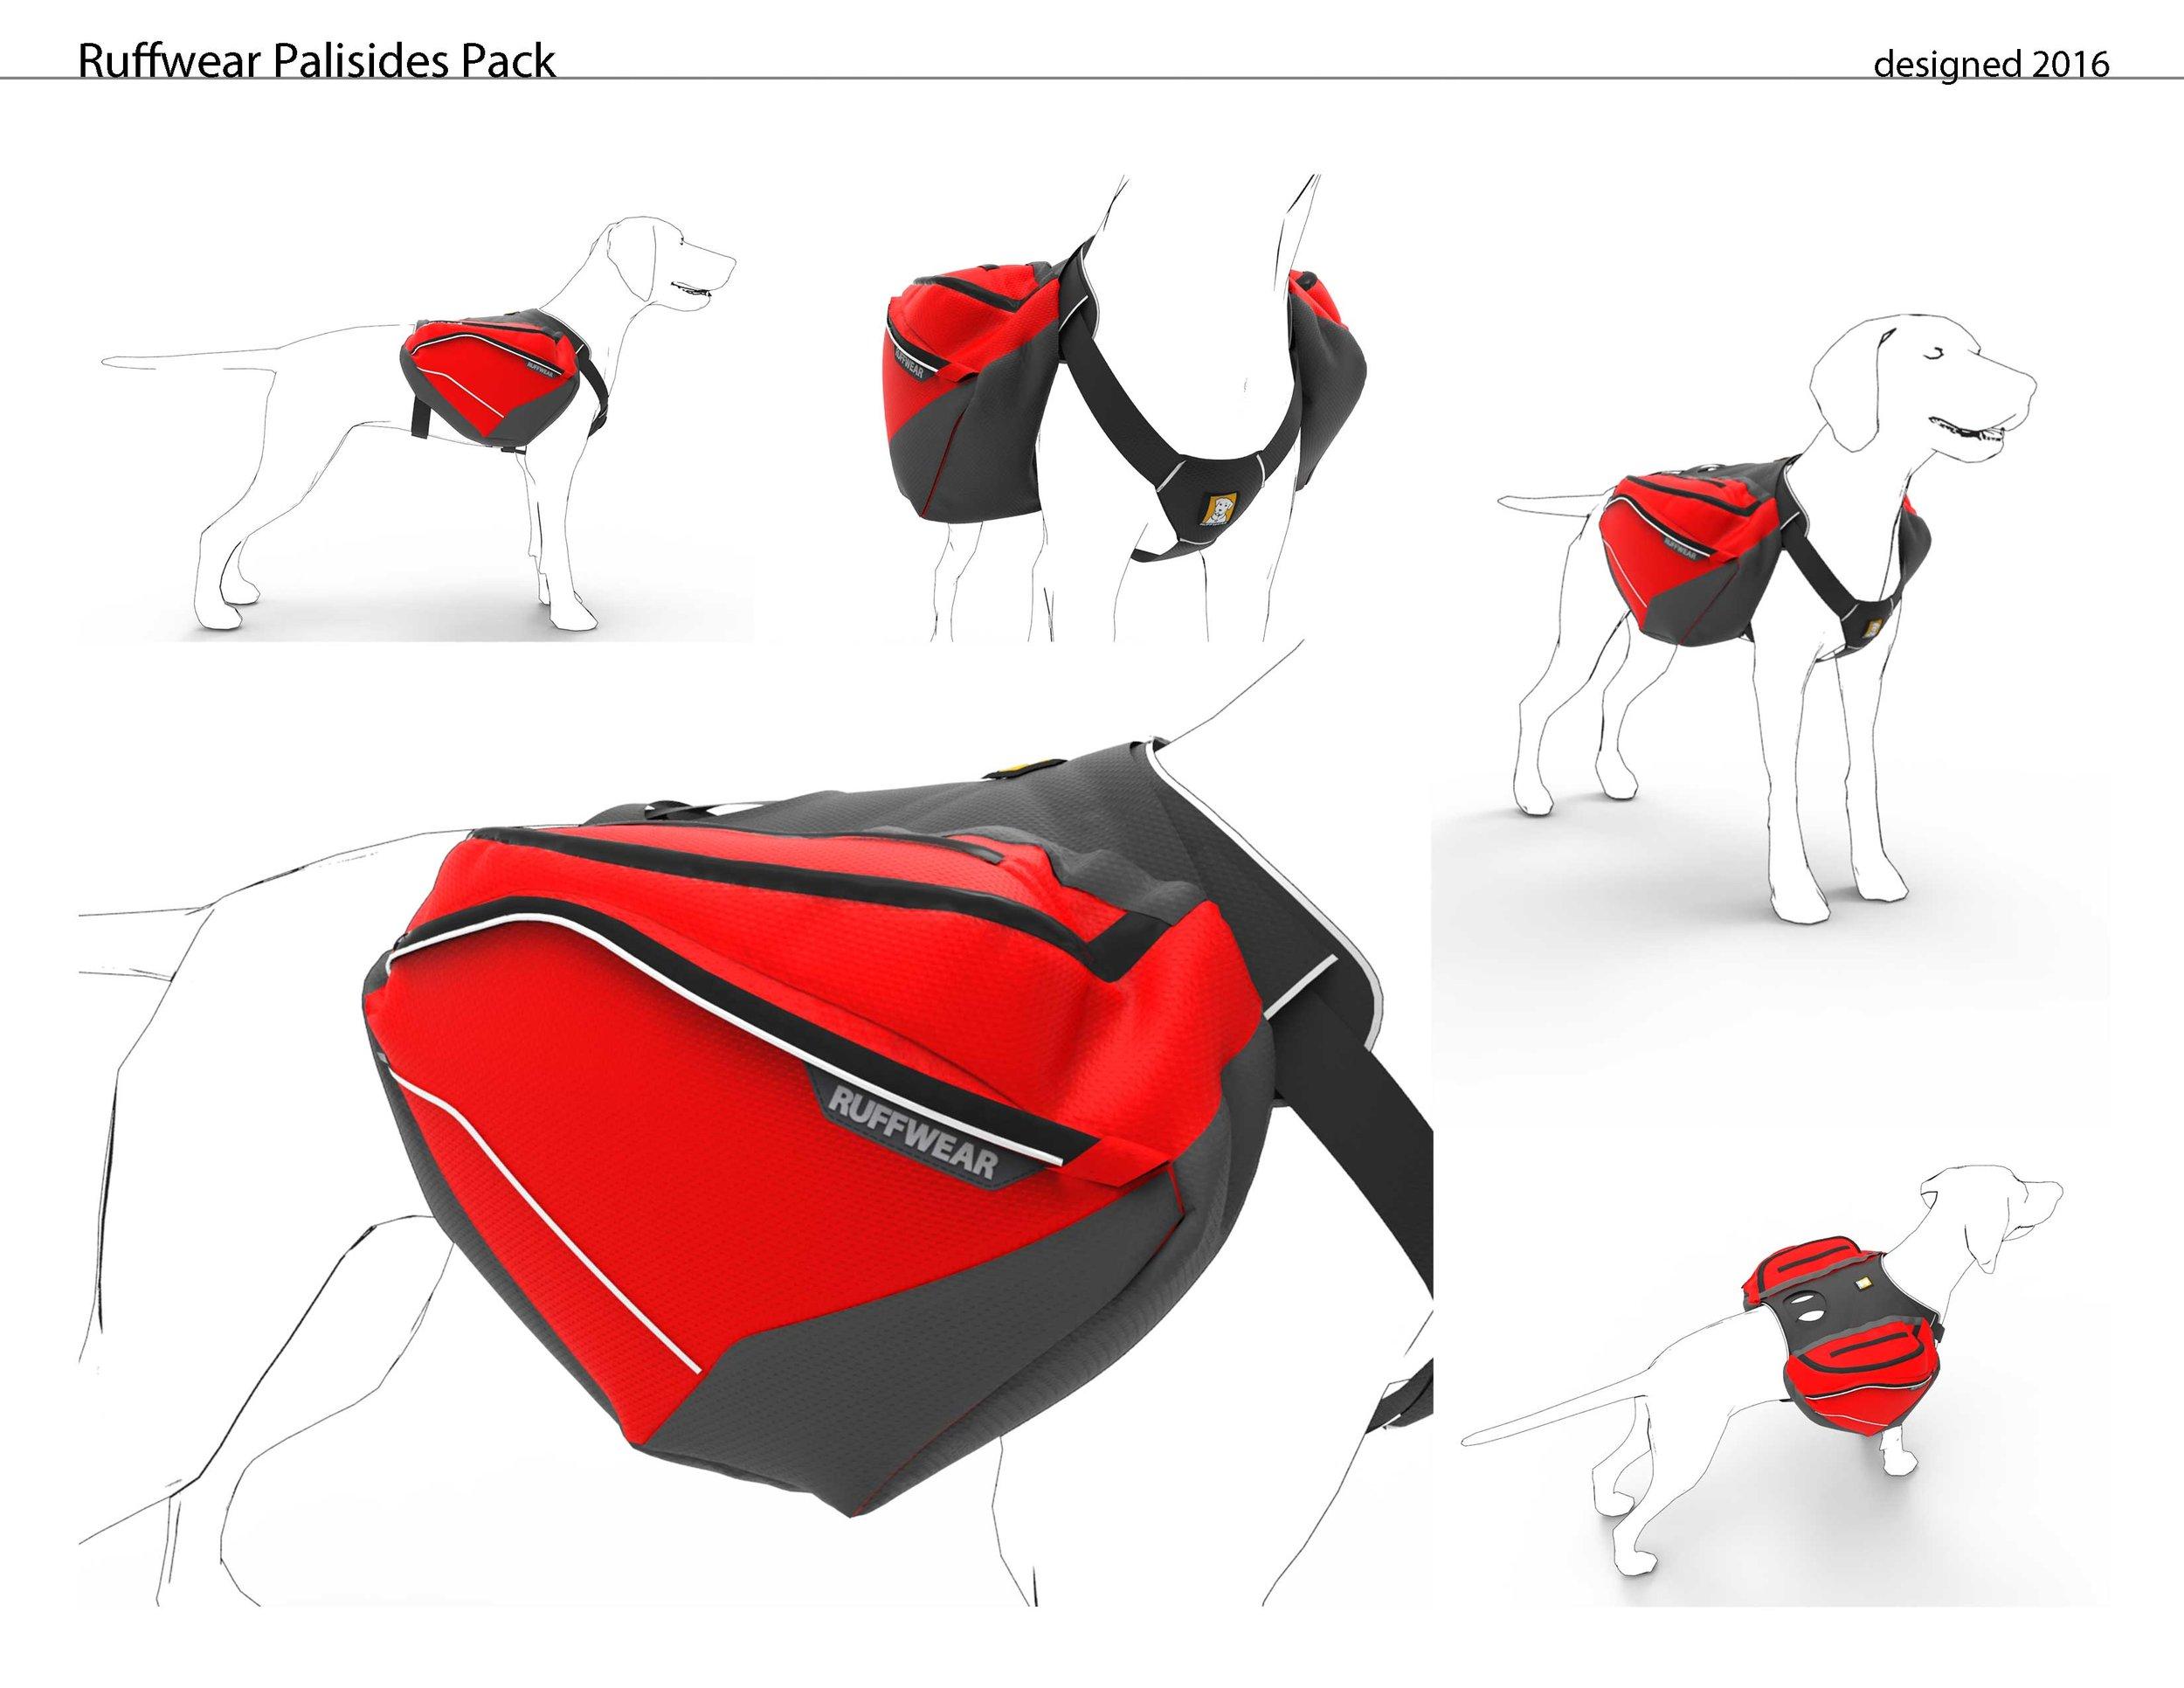 Ruffwear-Palisides-Pack.jpg